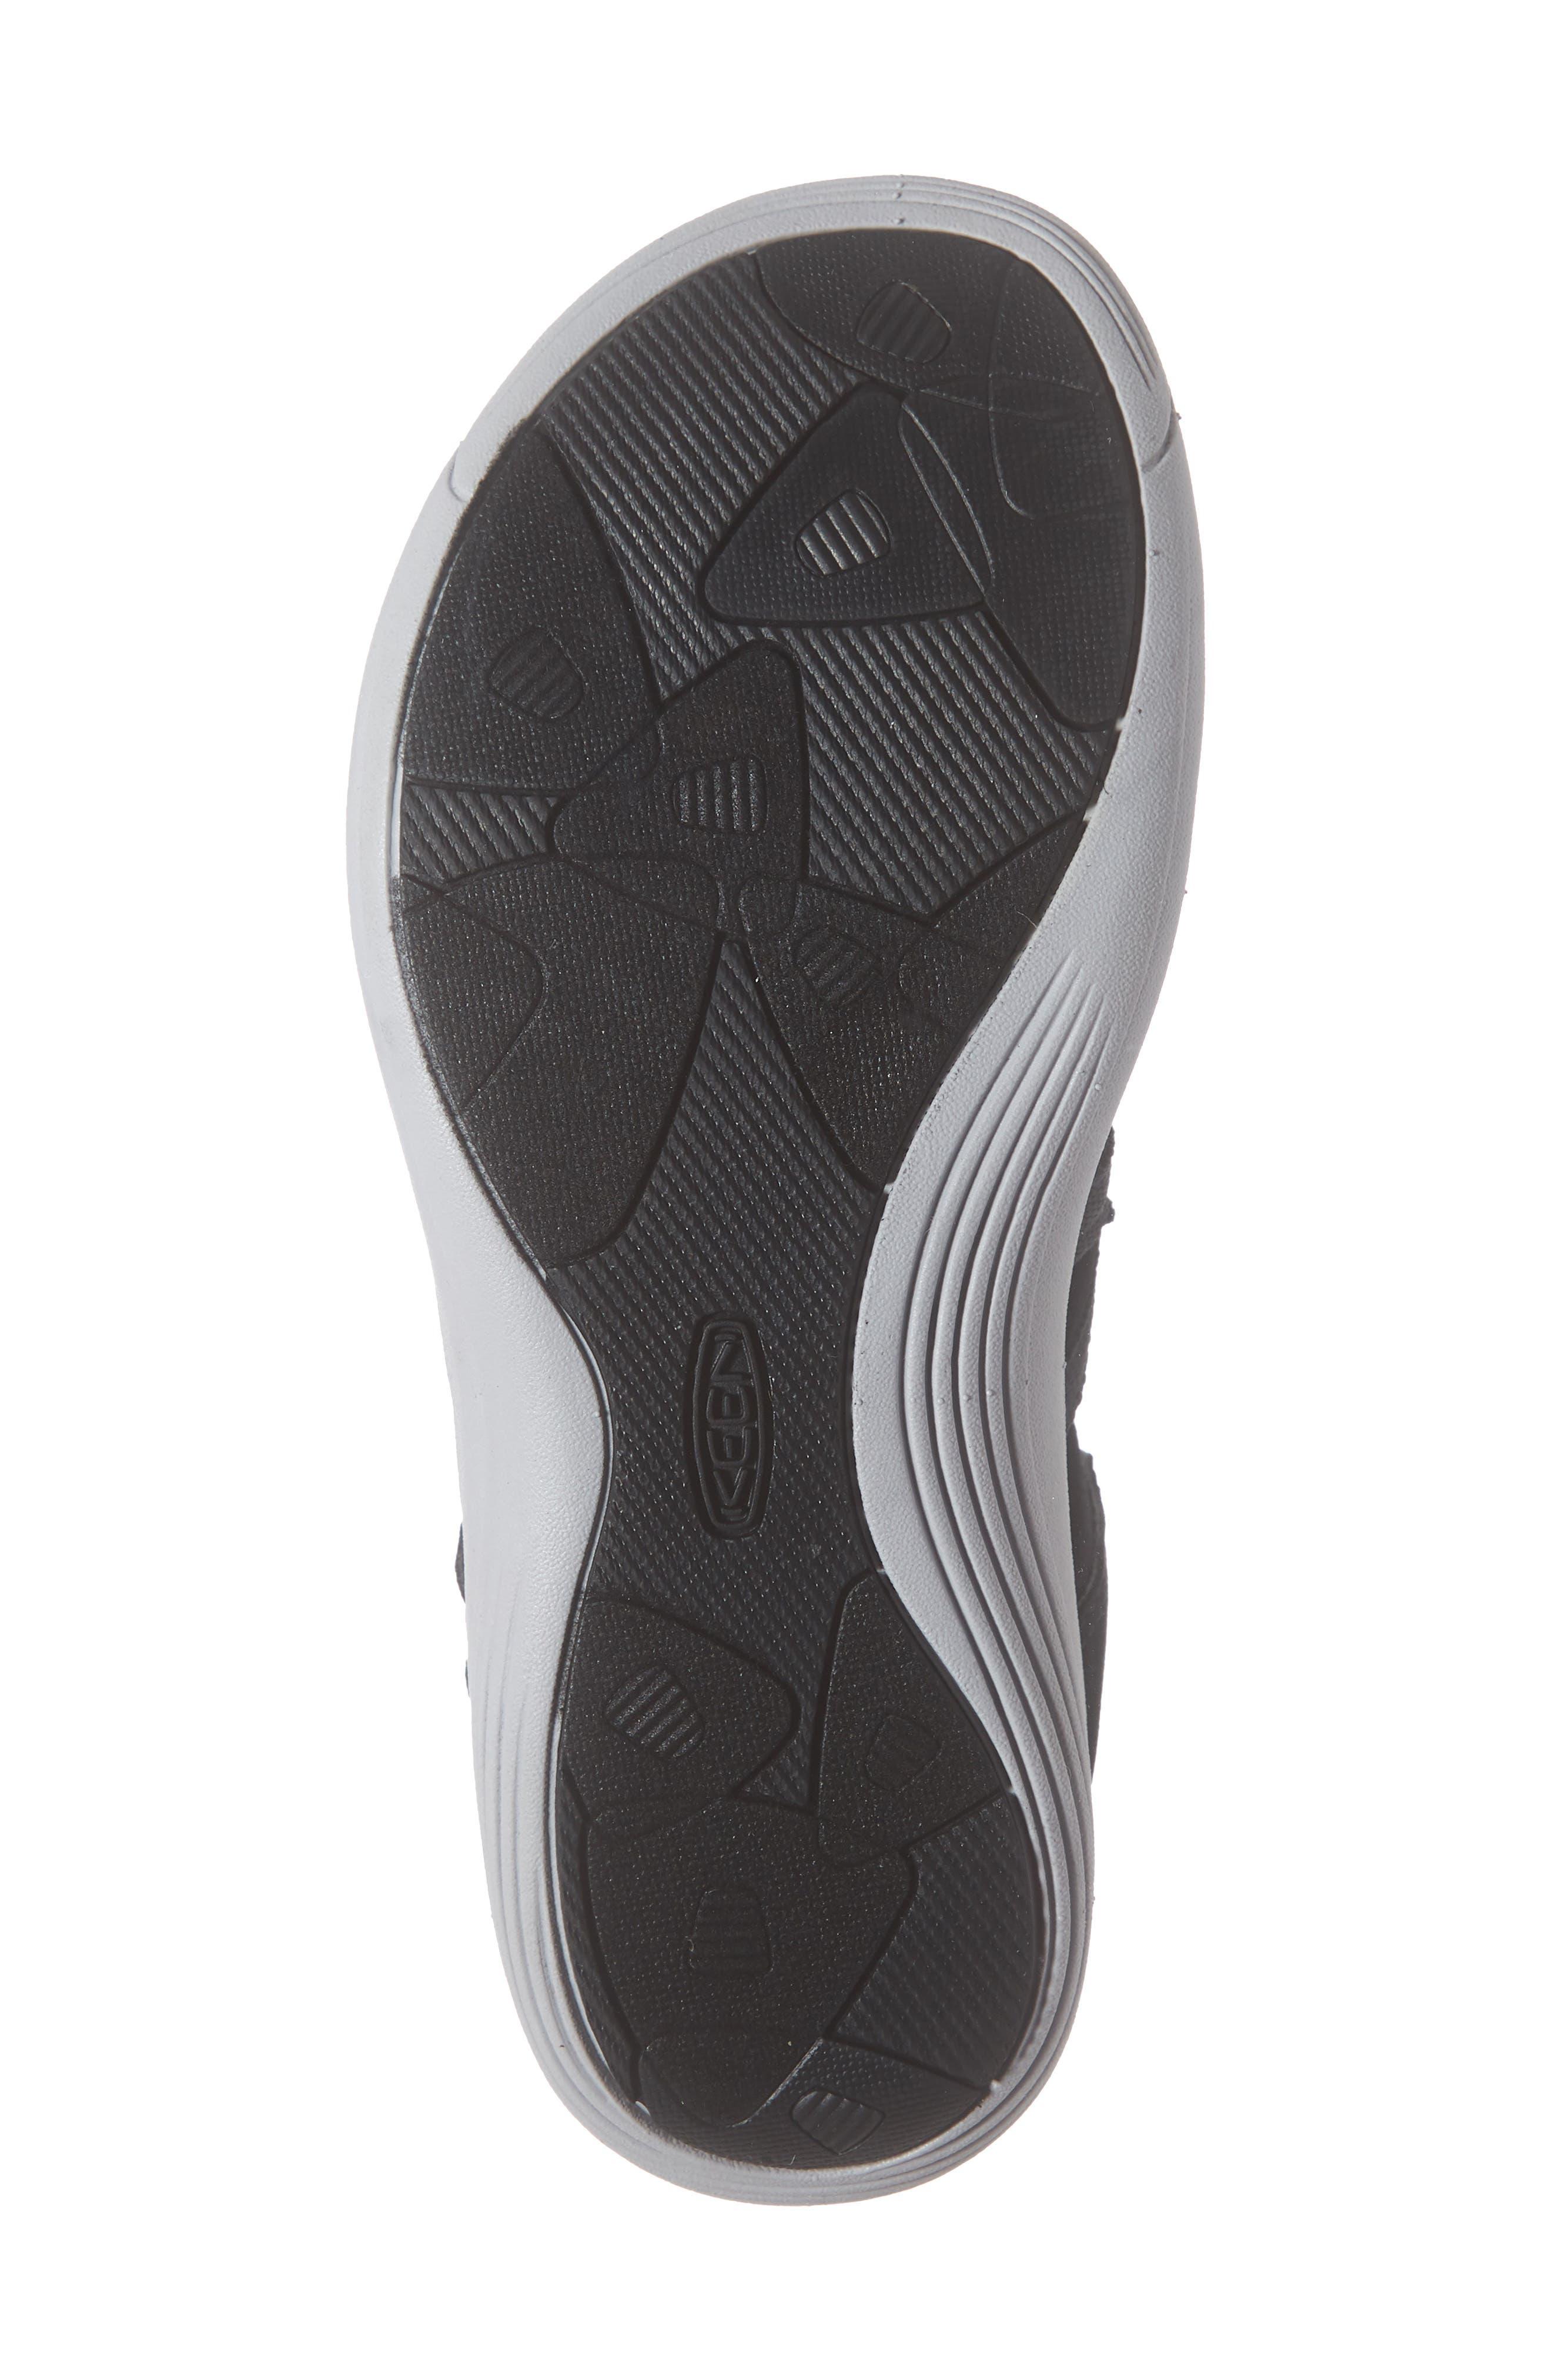 KEEN, Damaya Lattice Sandal, Alternate thumbnail 6, color, BLACK/ VAPOR FABRIC